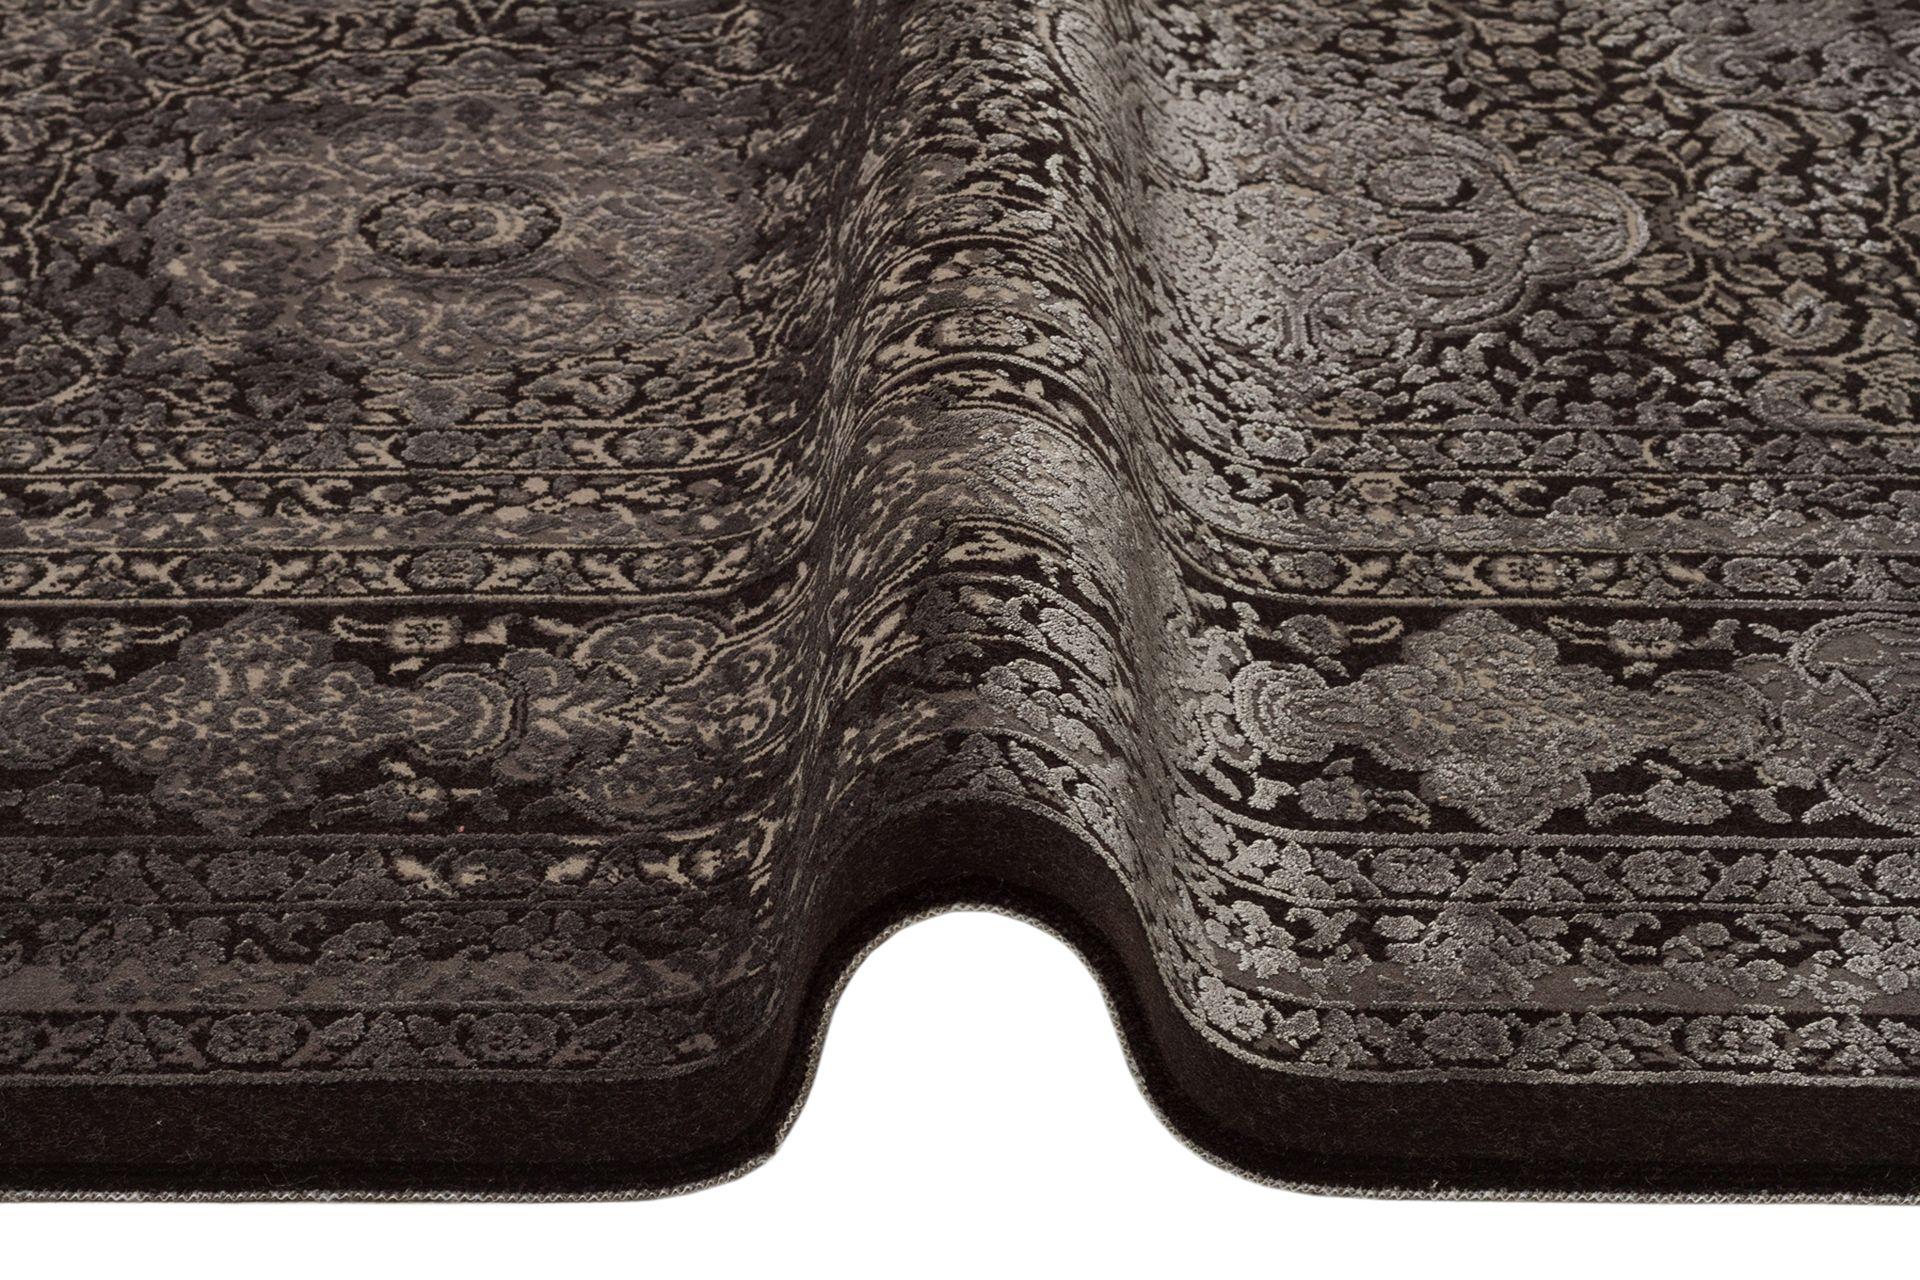 ANADOLU AD 02 ANTRASİT GRİ KLASİK DESENLİ SALON HALISI 300x400